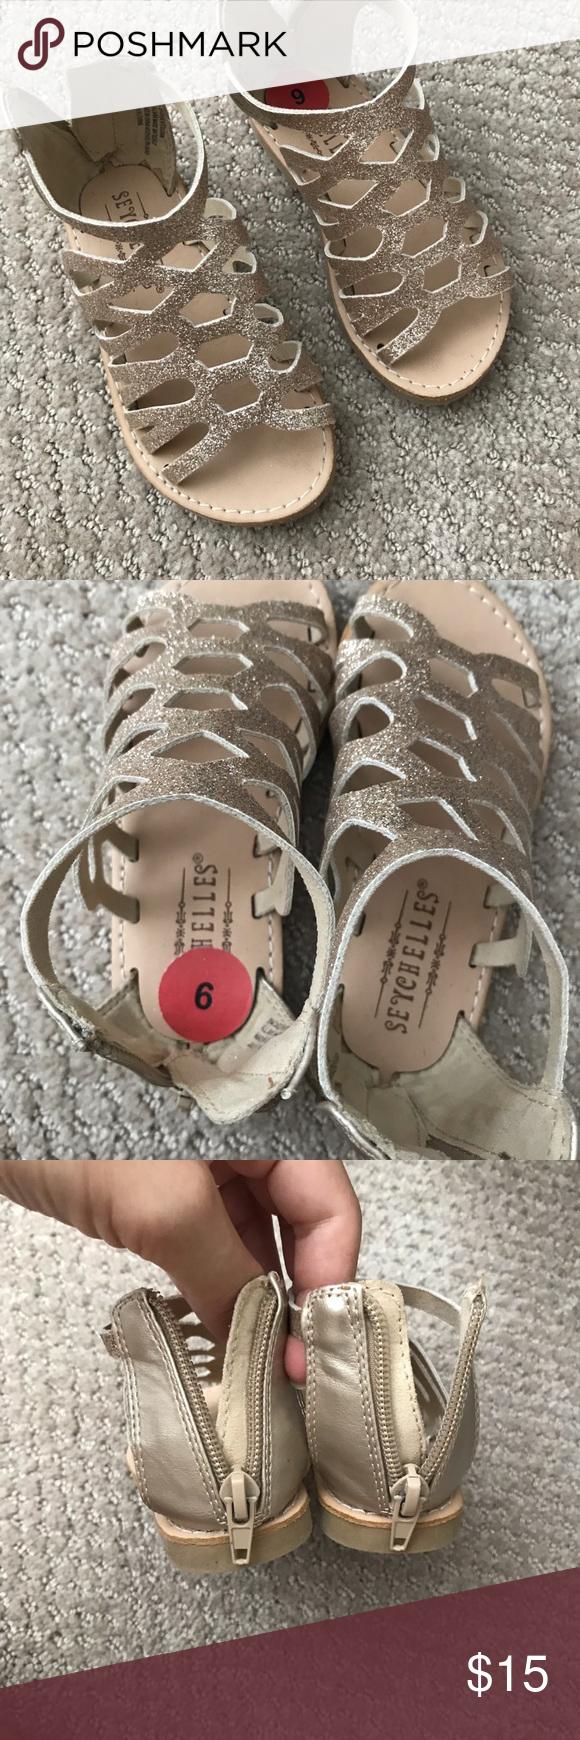 Toddler sandals, Seychelles shoes